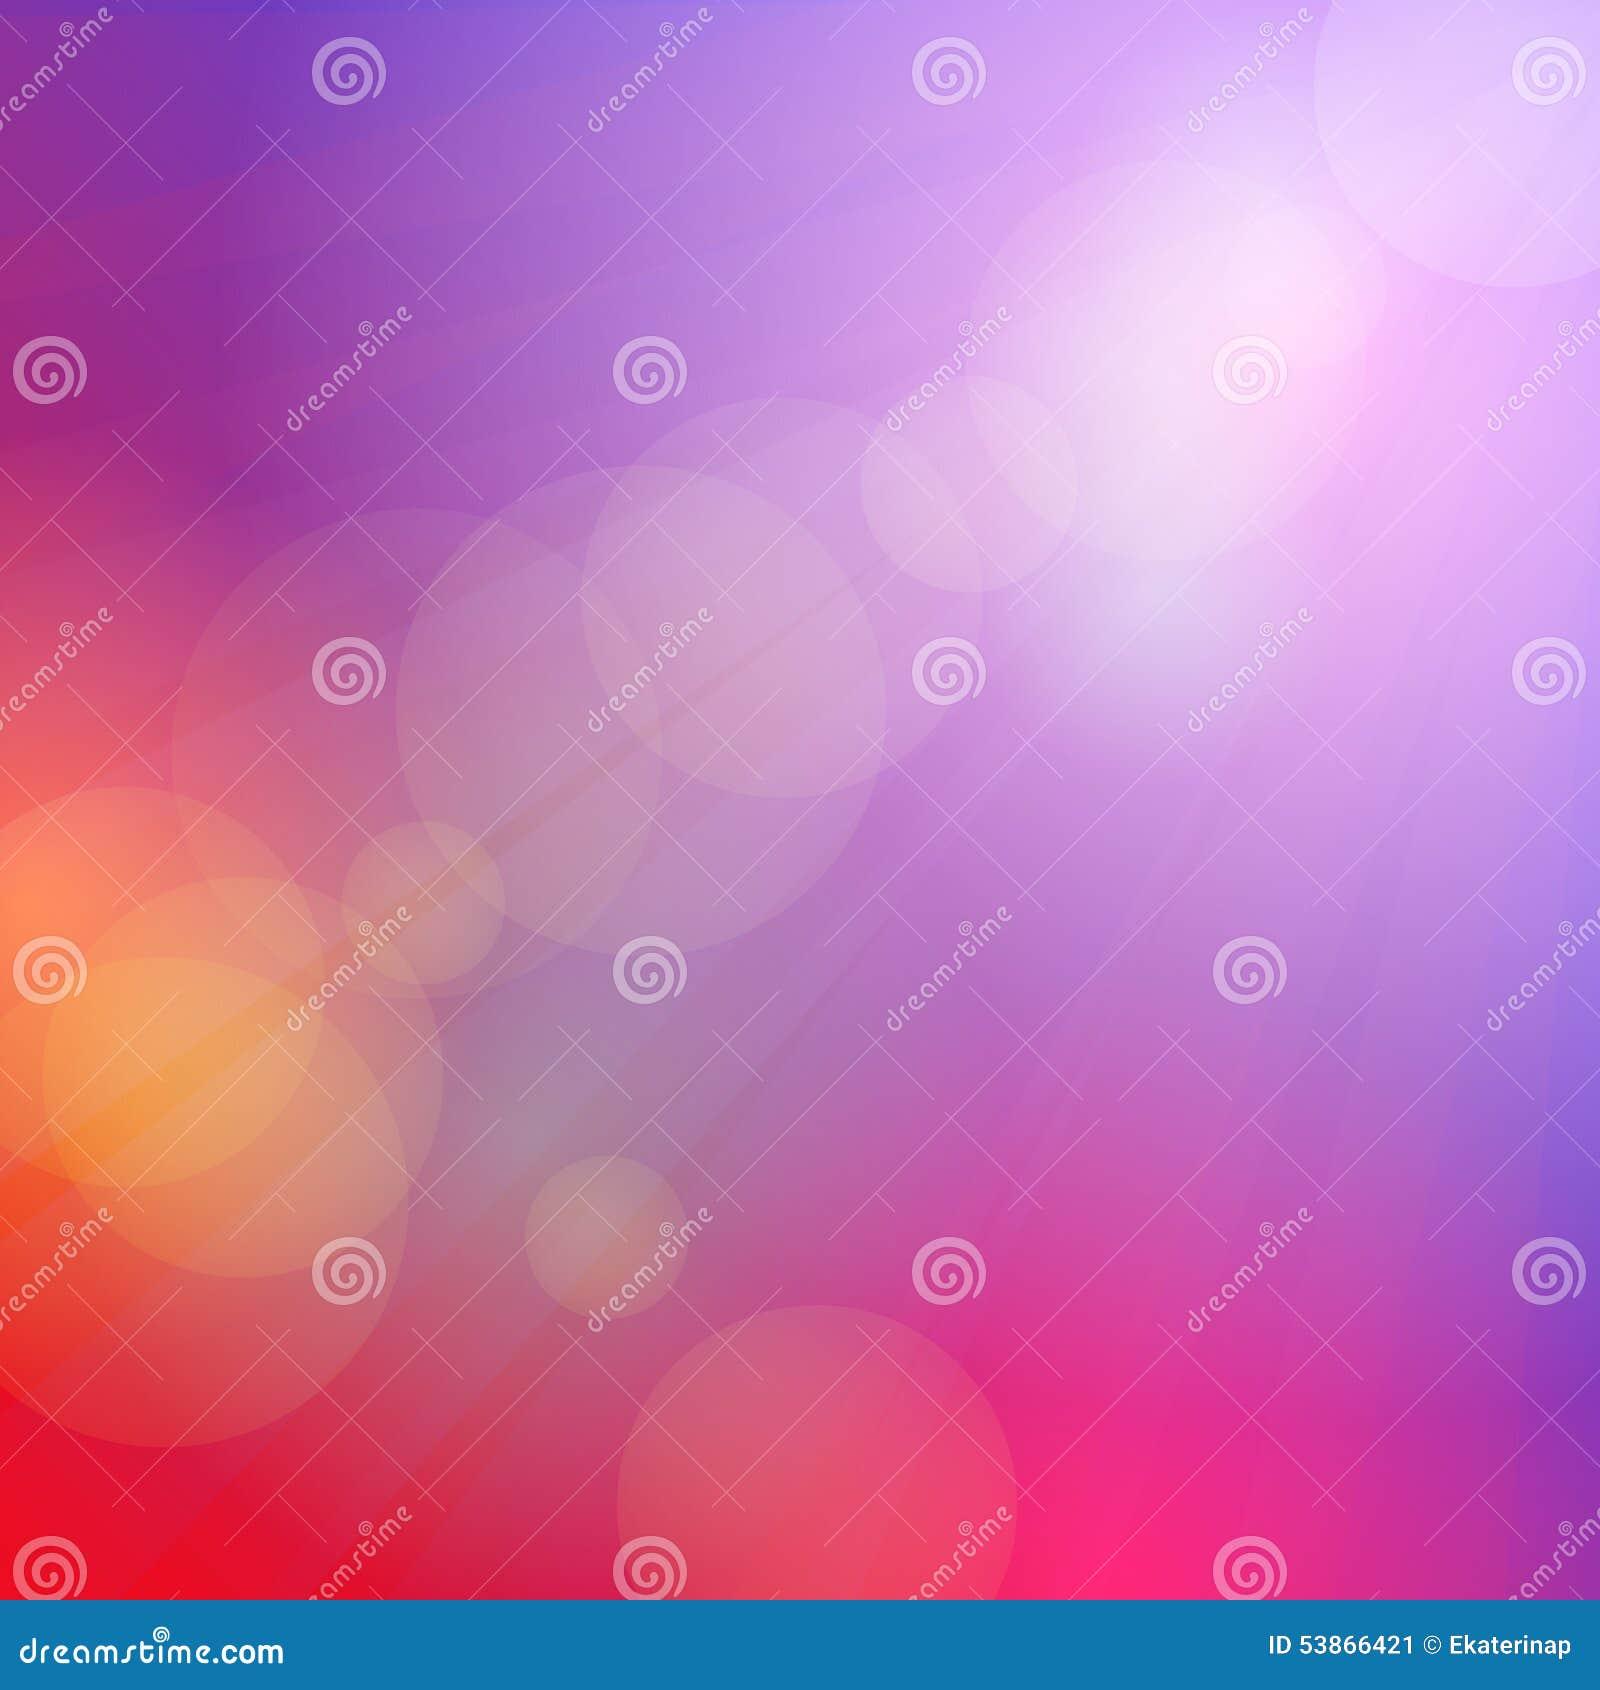 Abstracte hemel roze achtergrond, zonsondergang, dageraad, gekleurd zacht Vector